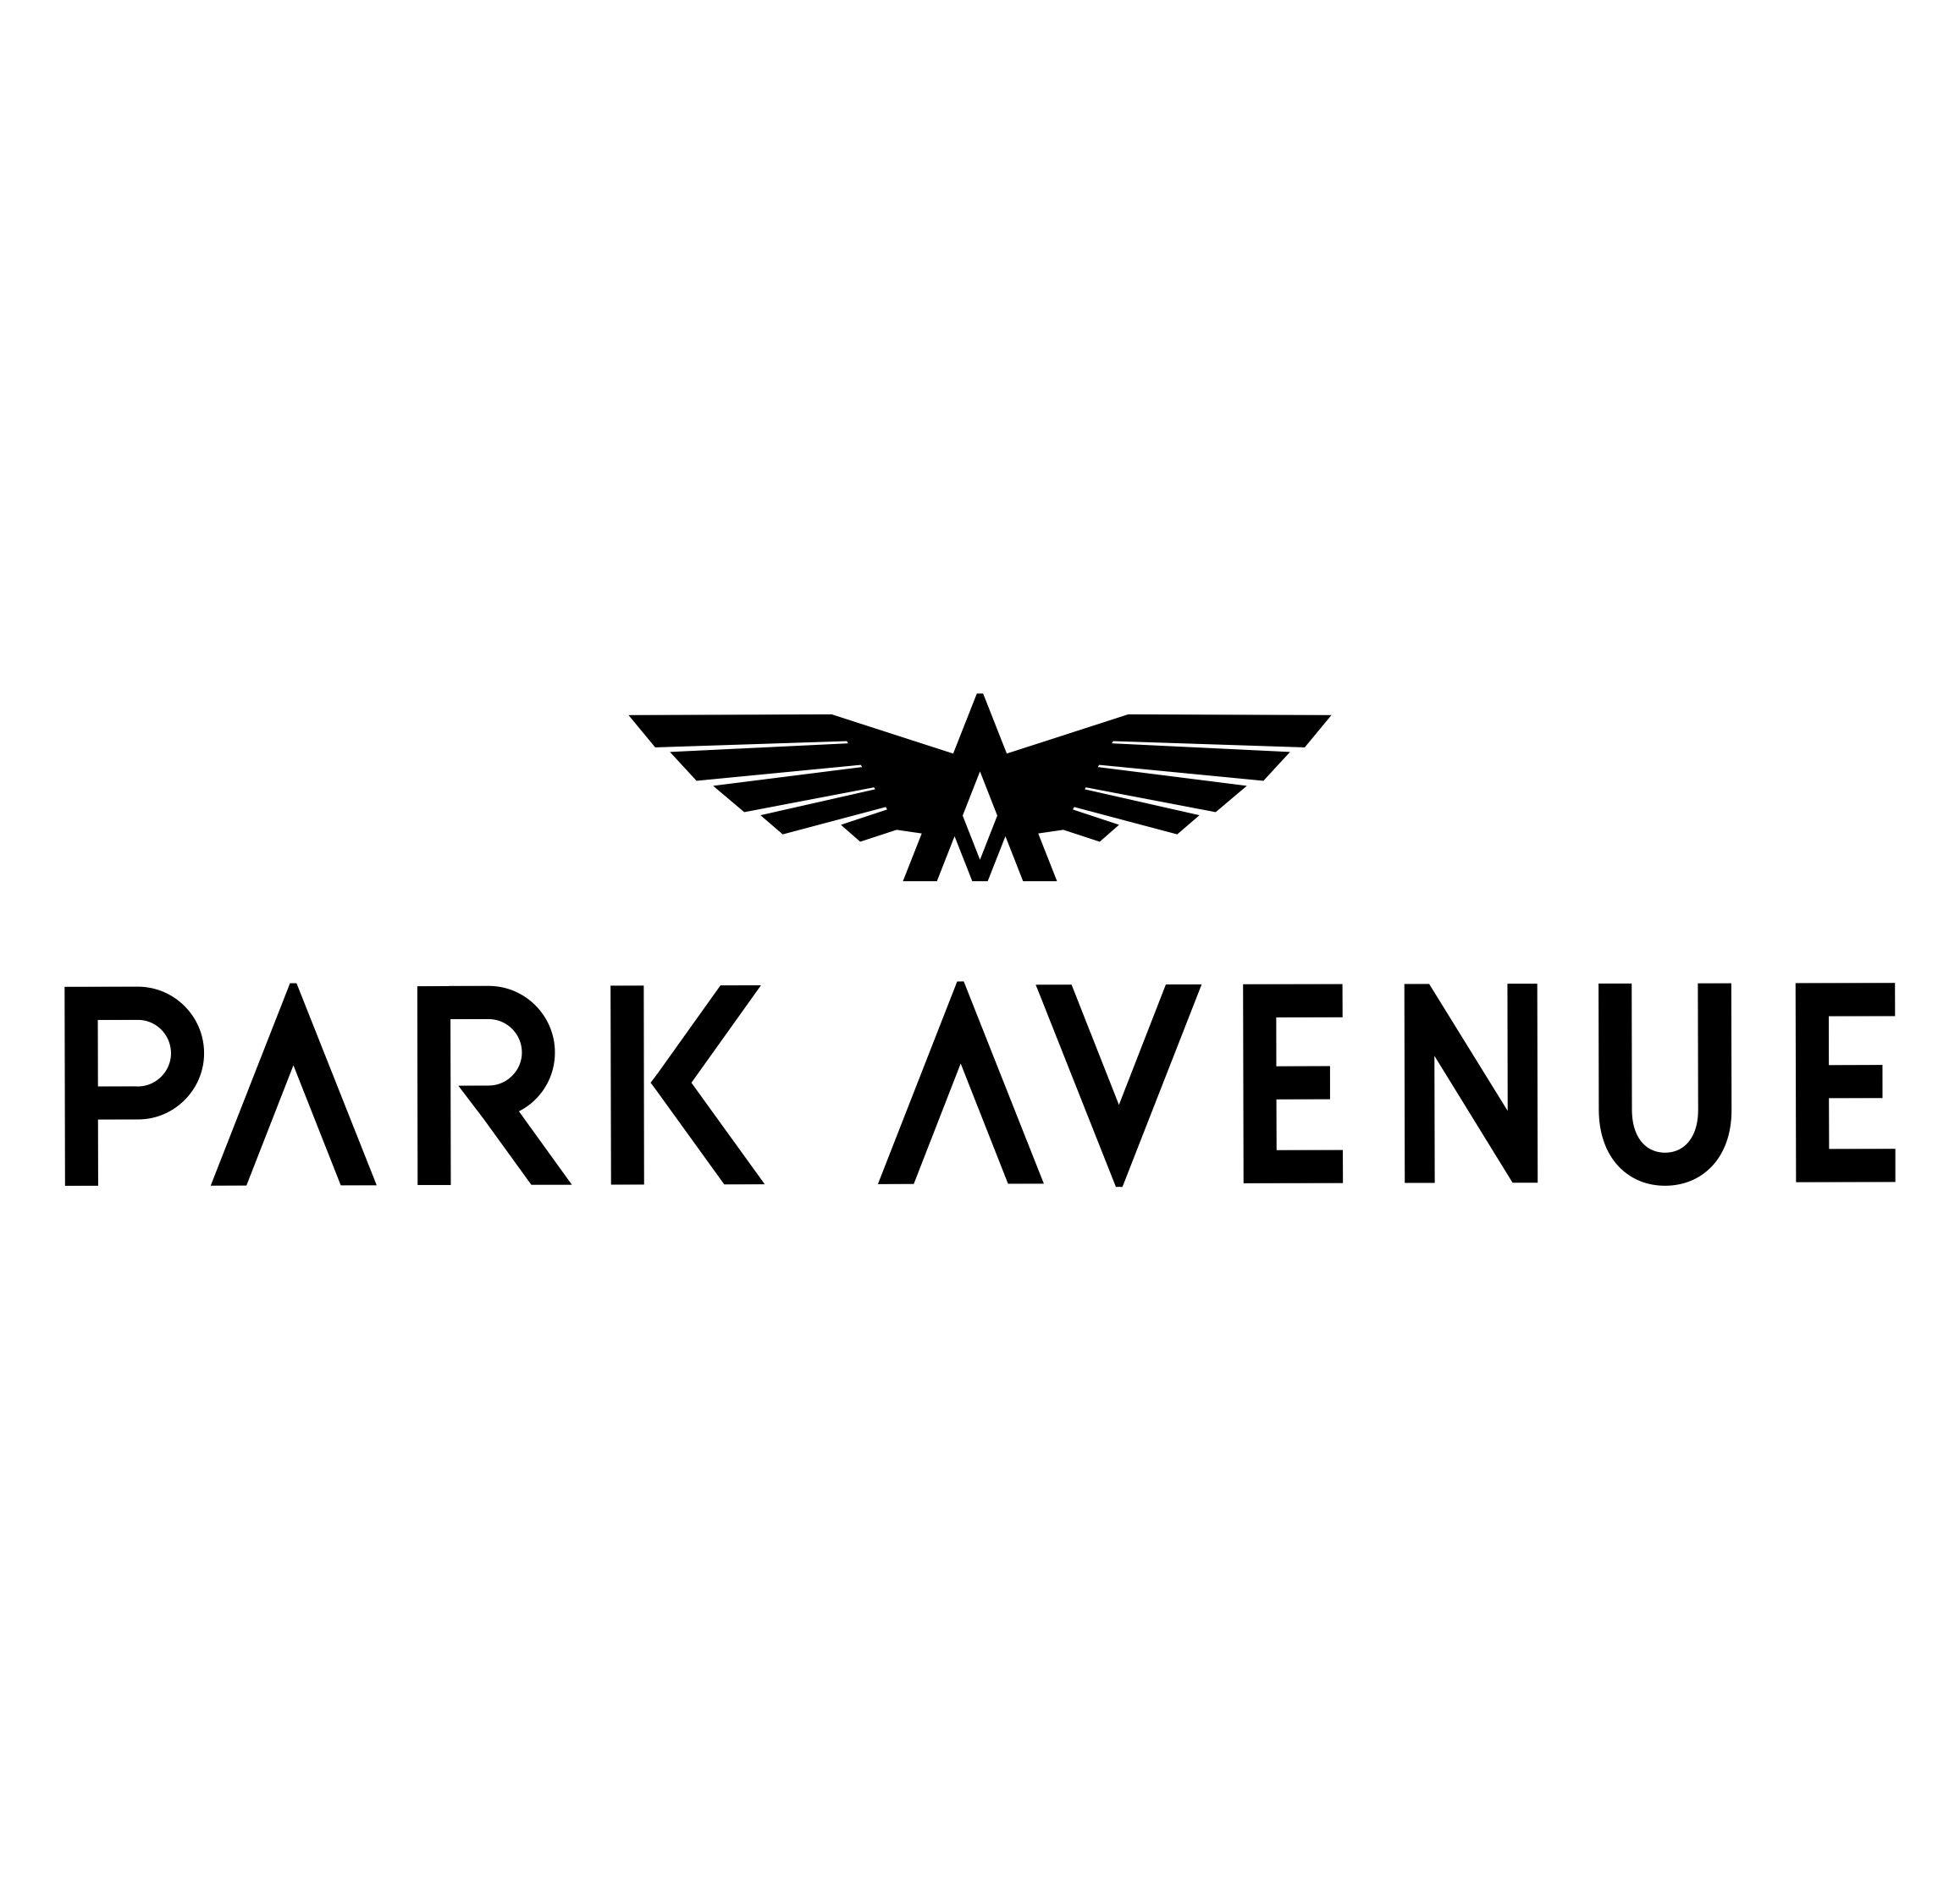 park avenue | clothing logo, ? logo, free logo